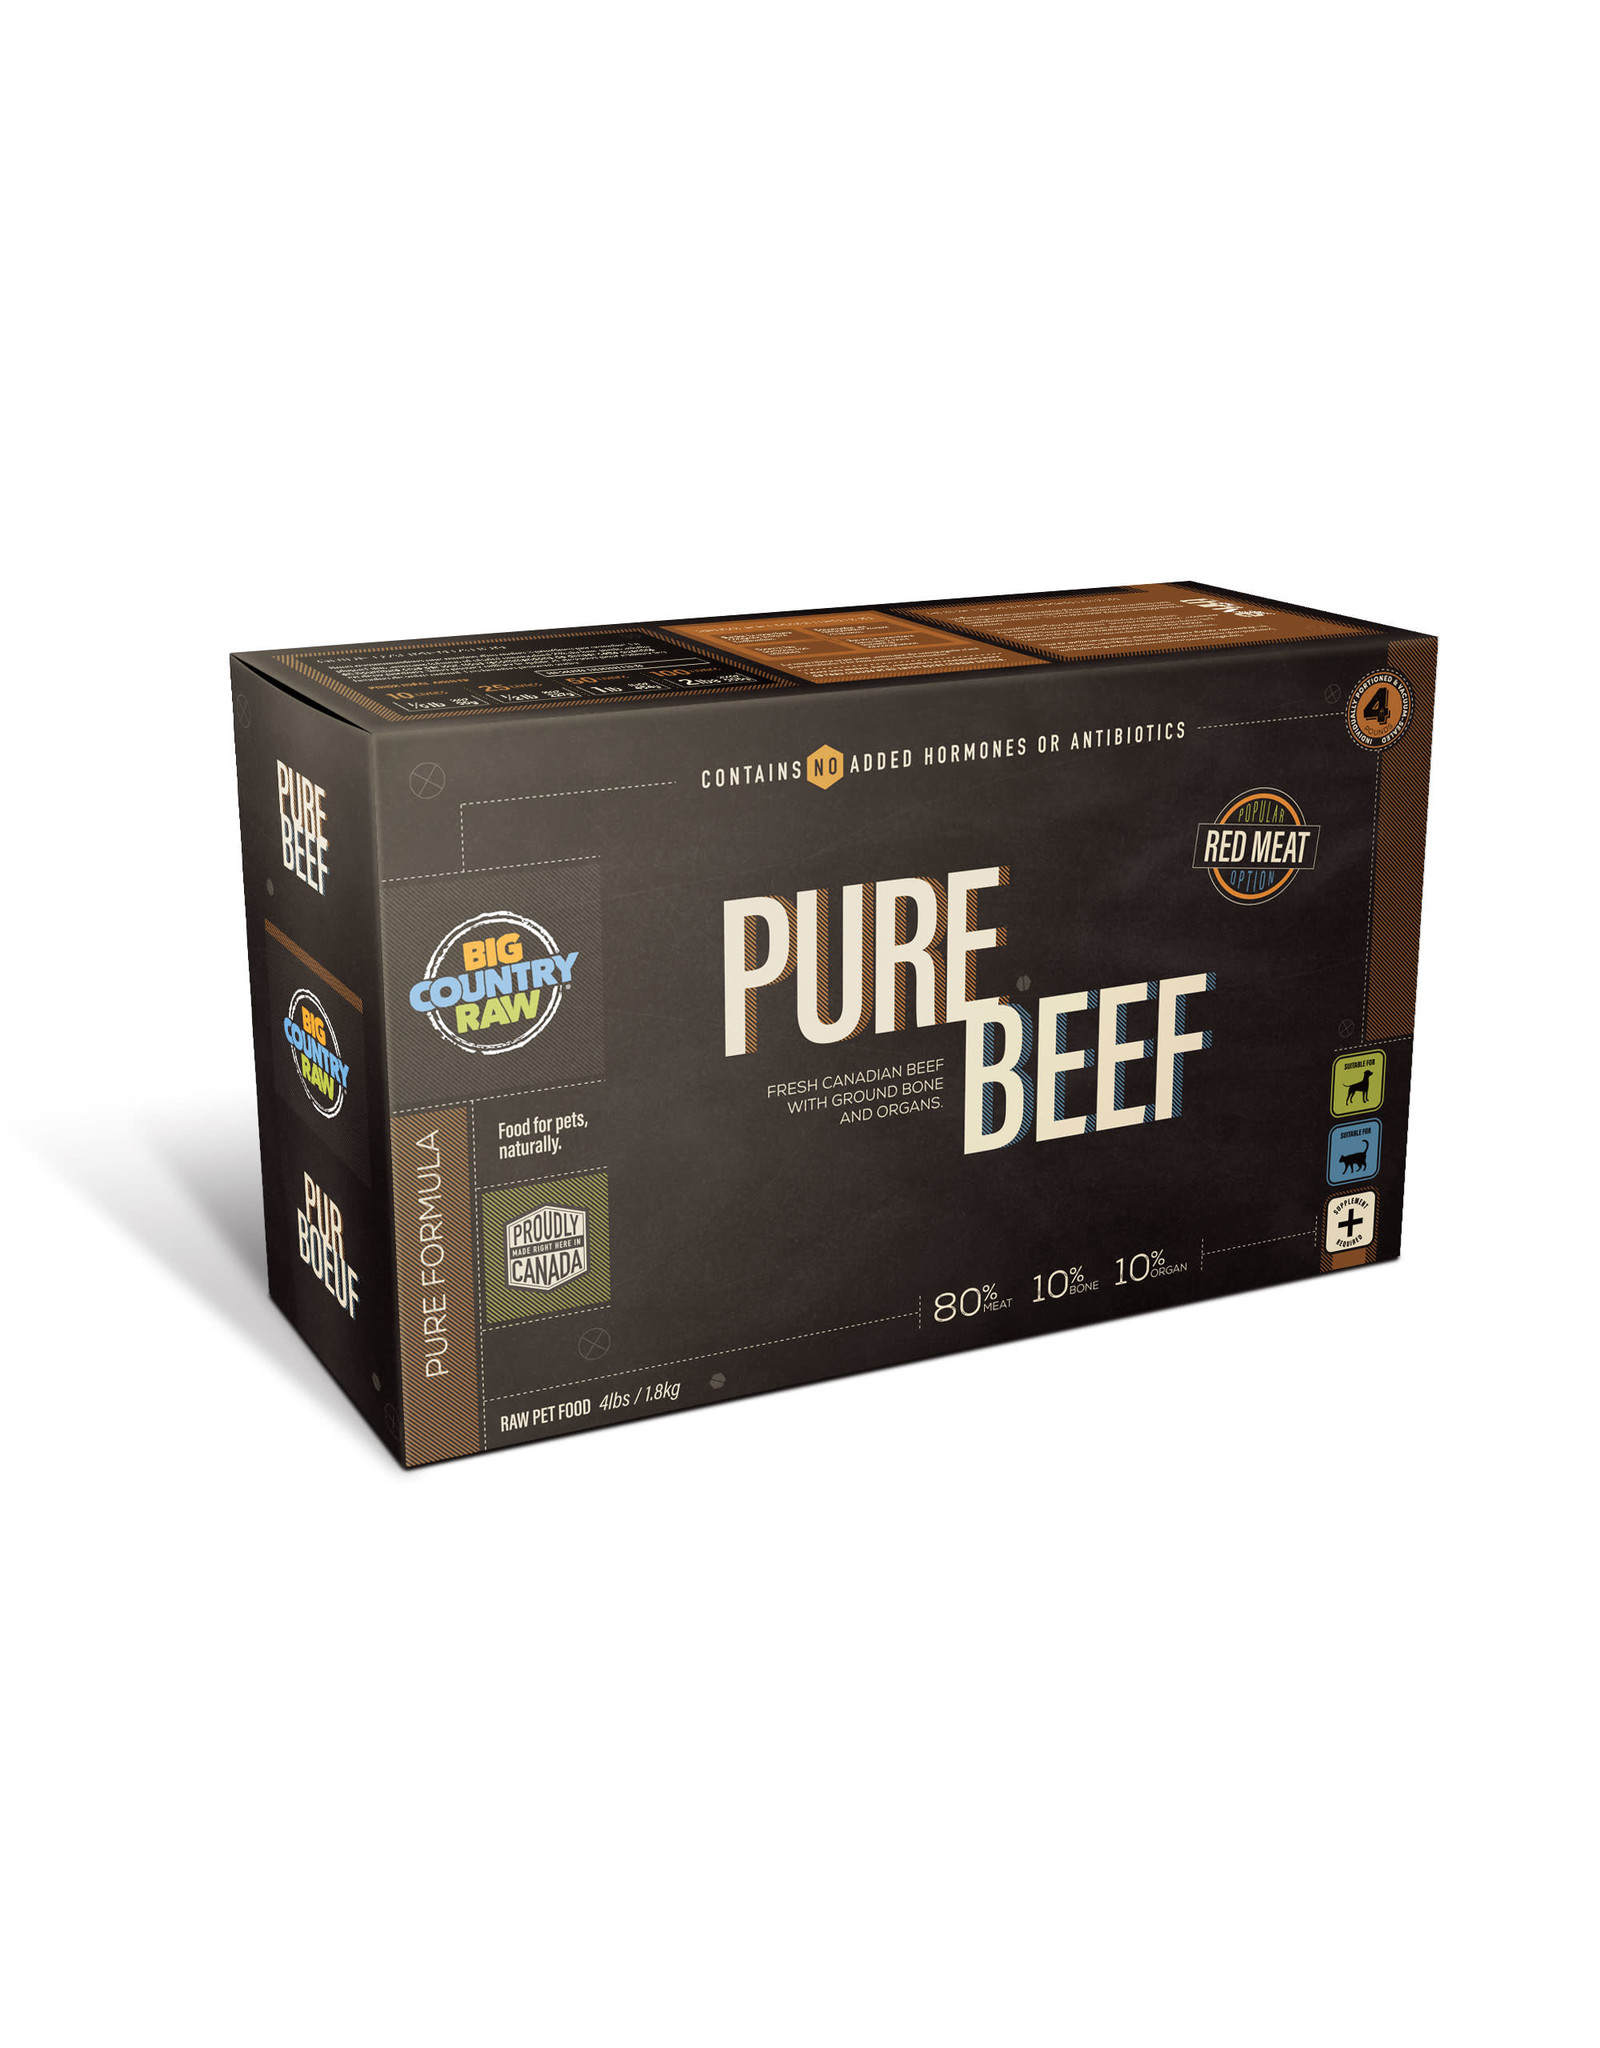 BCR BCR CARTON - 4x1lb - Pure Beef